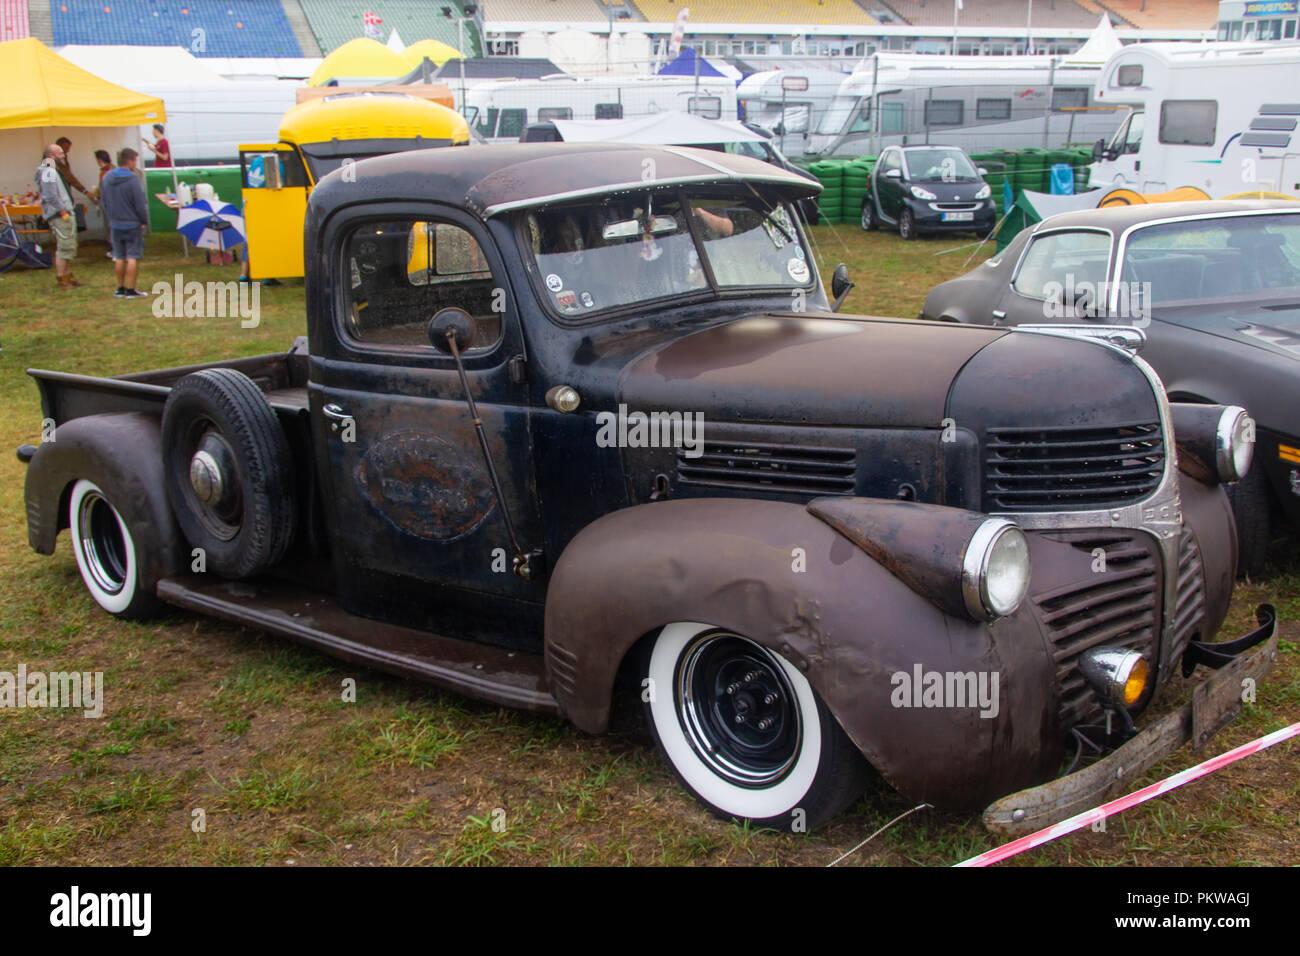 Rusty 1946 Dodge WD-15 Pro Touring Rat Rod vintage pickup